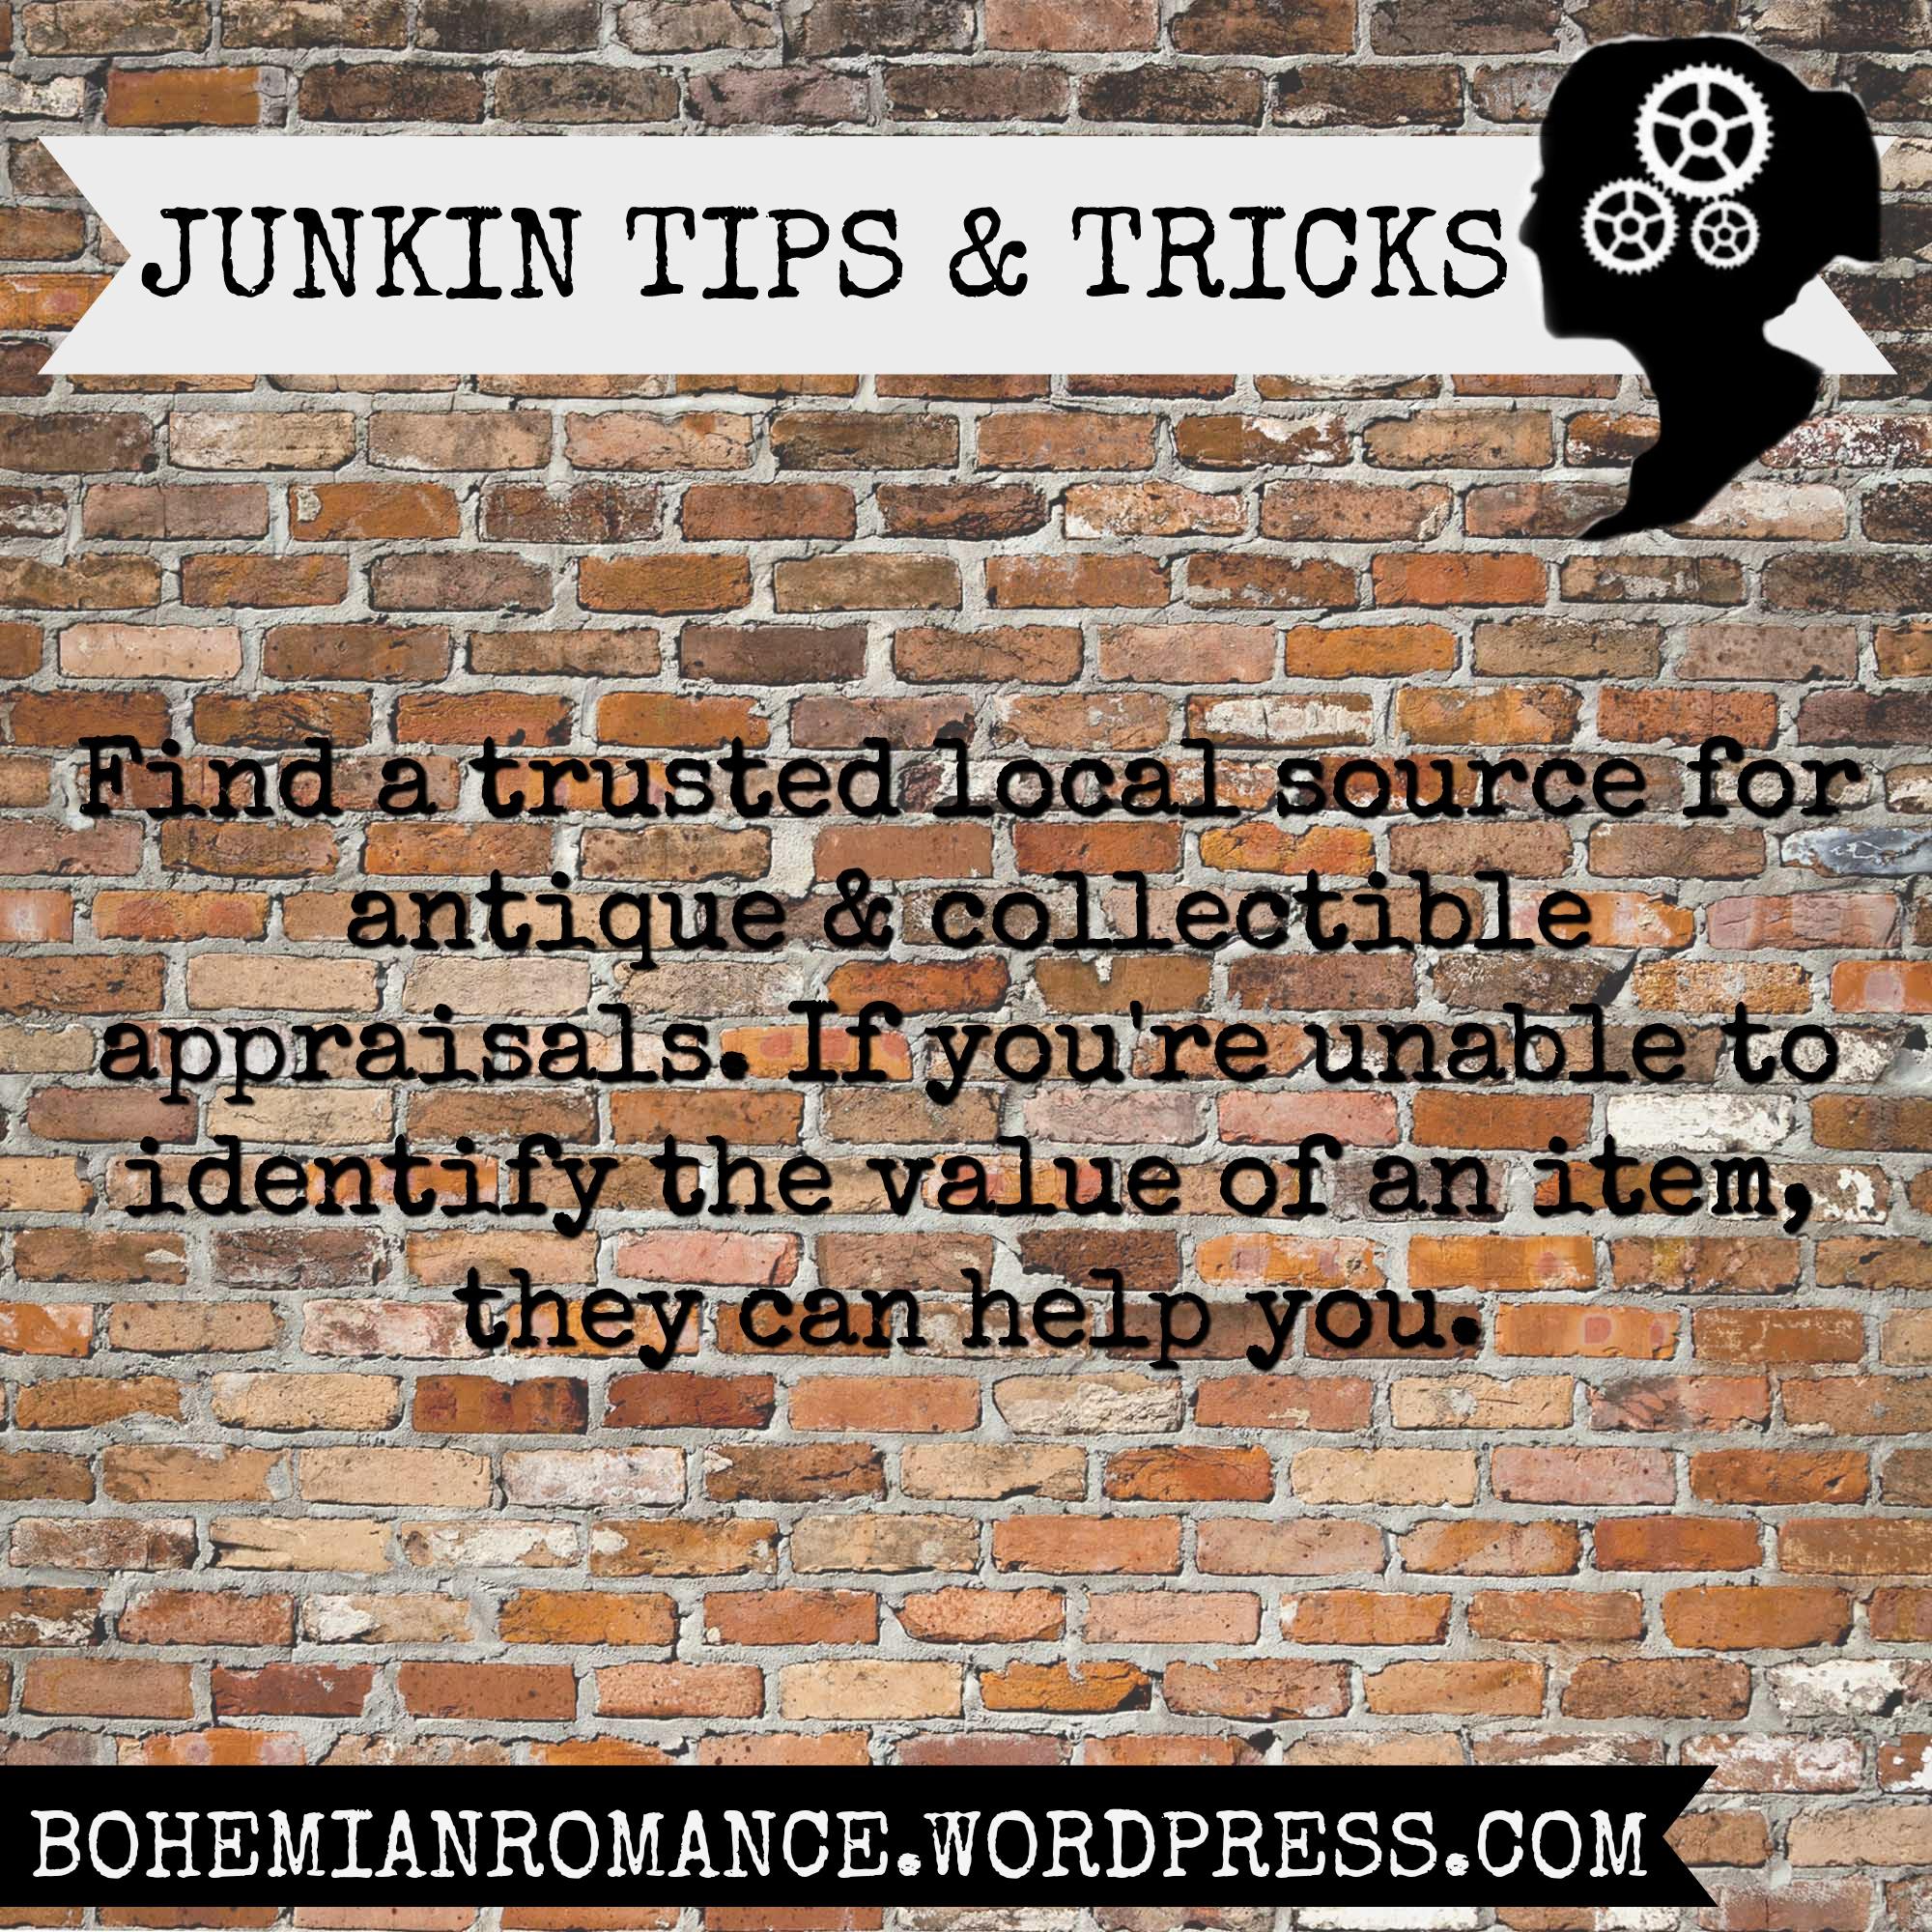 13-junkin-tips-tricks-template